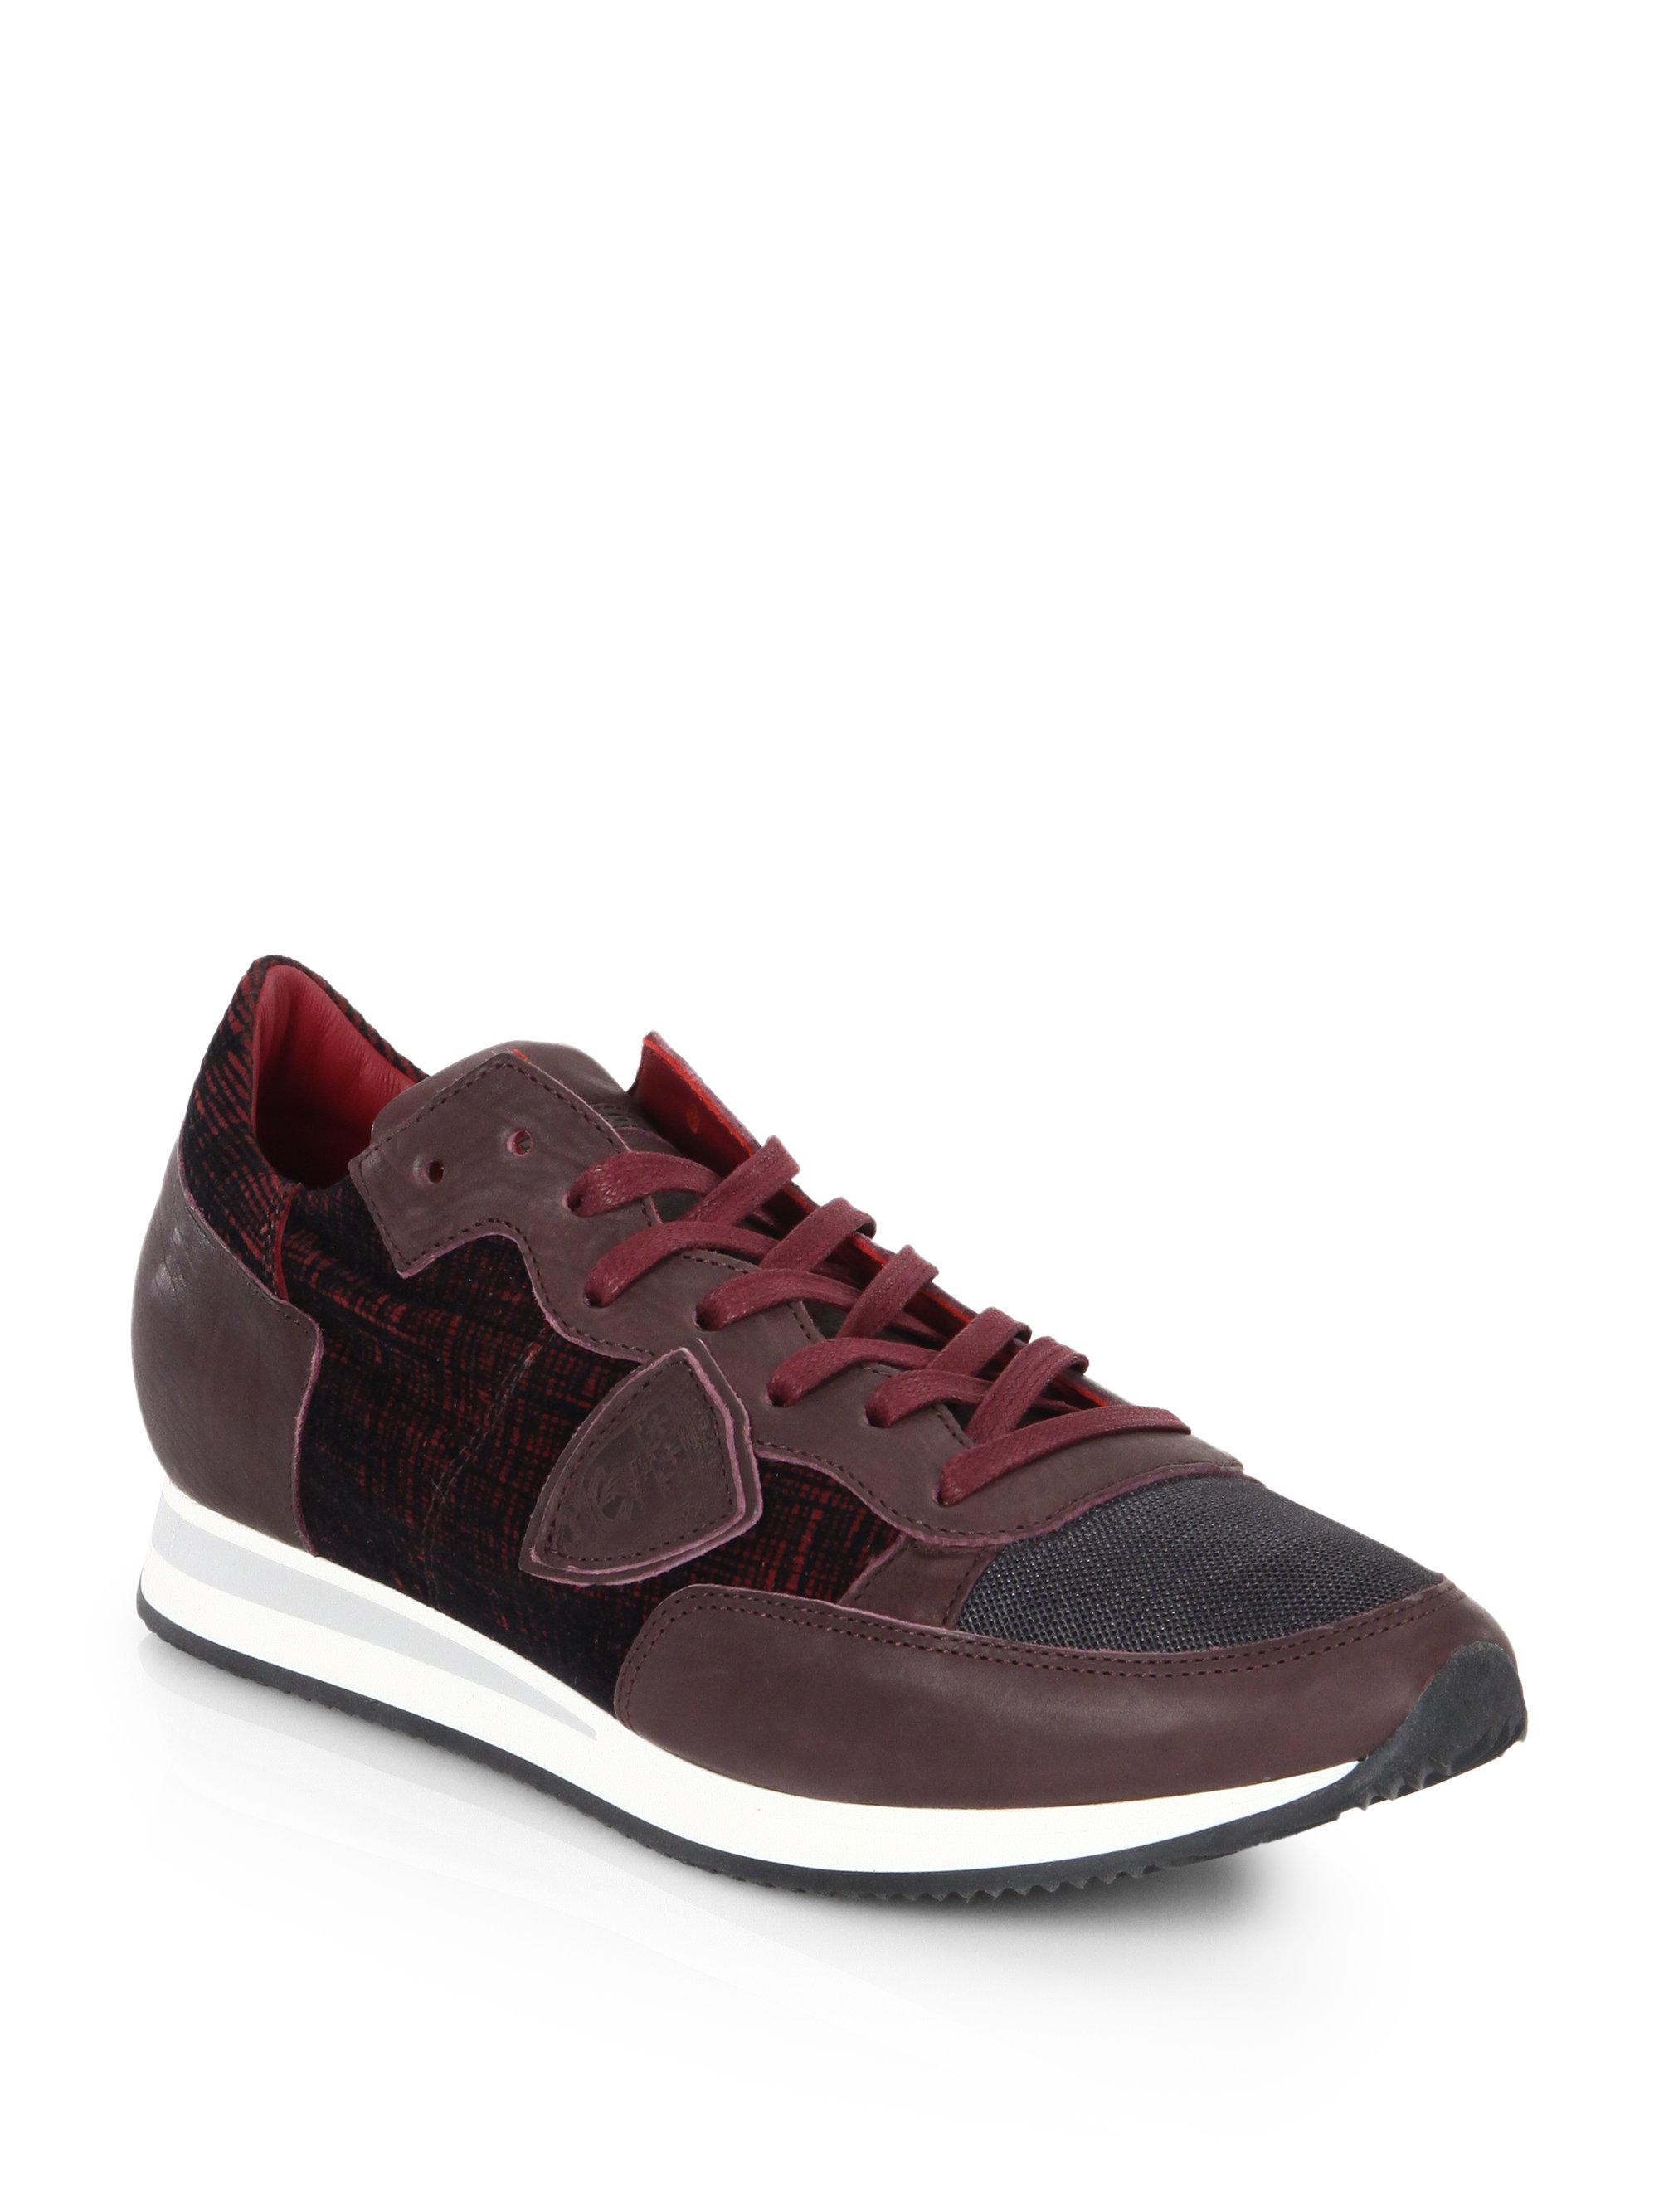 Philippe model Tropez Lace-Up Leather Low-Top Sneakers LtCiIfSJ